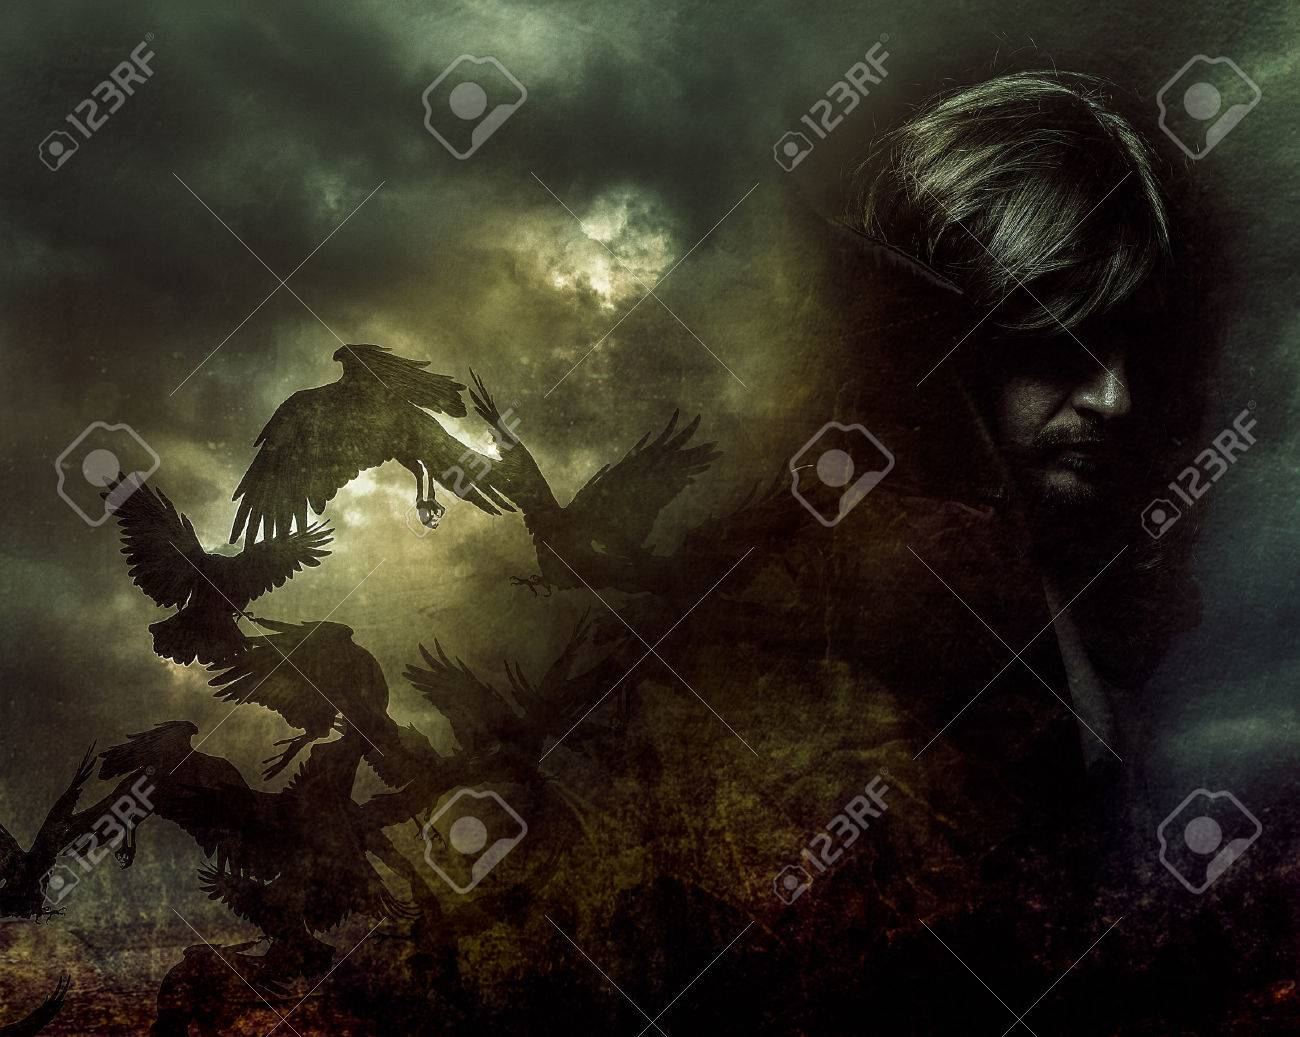 Paranormal, man with long hair and black coat - 33606906